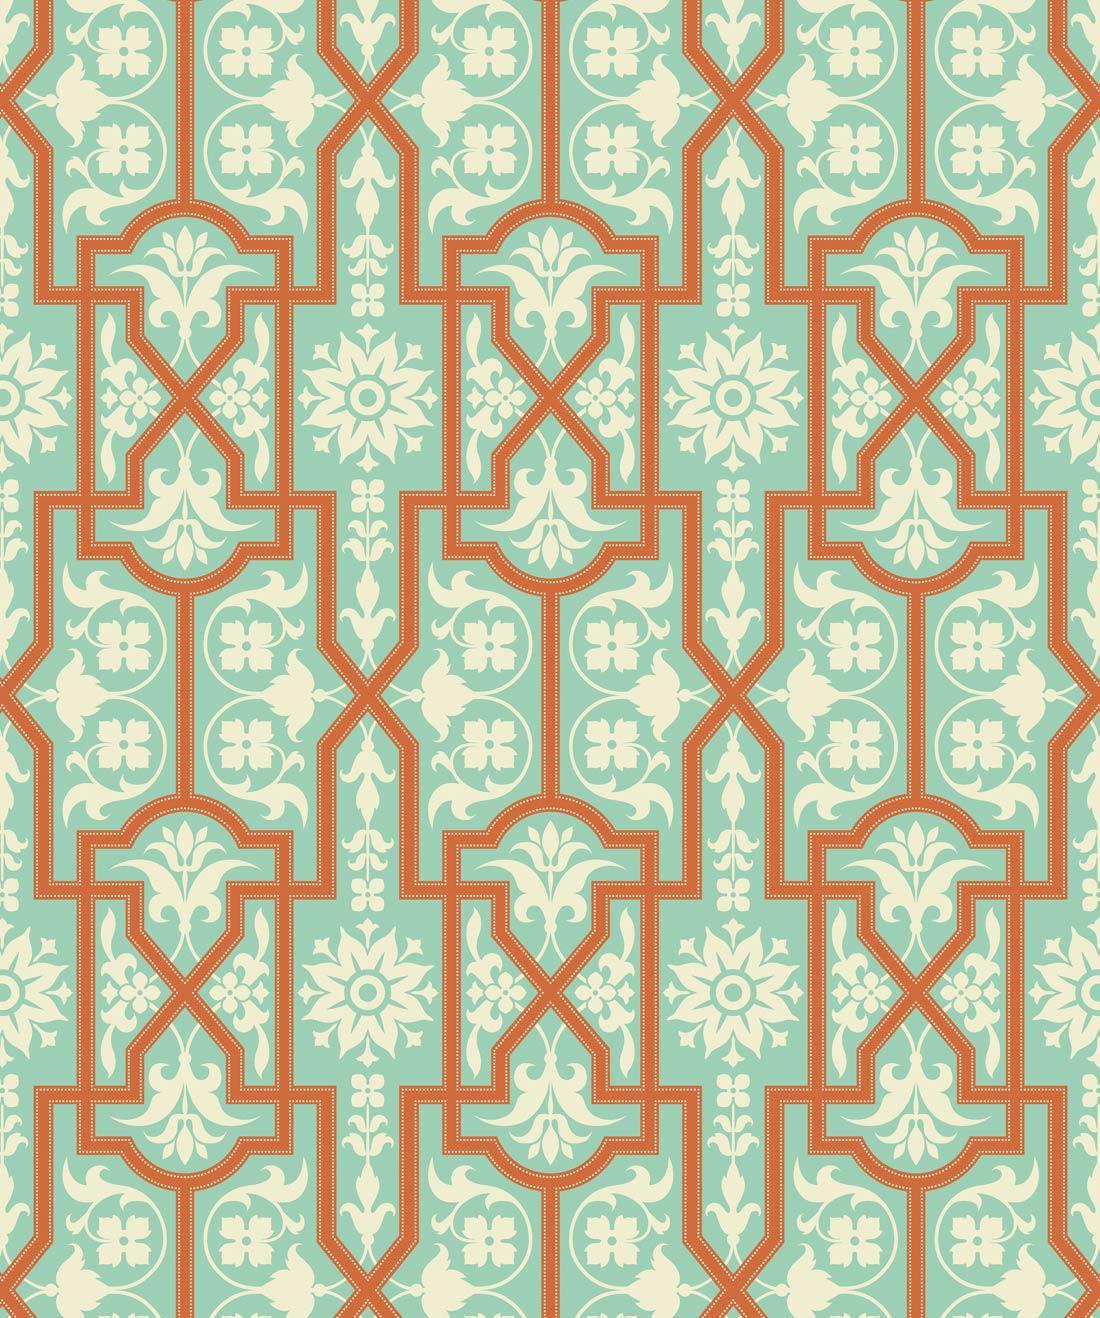 Architectural Wallpaper